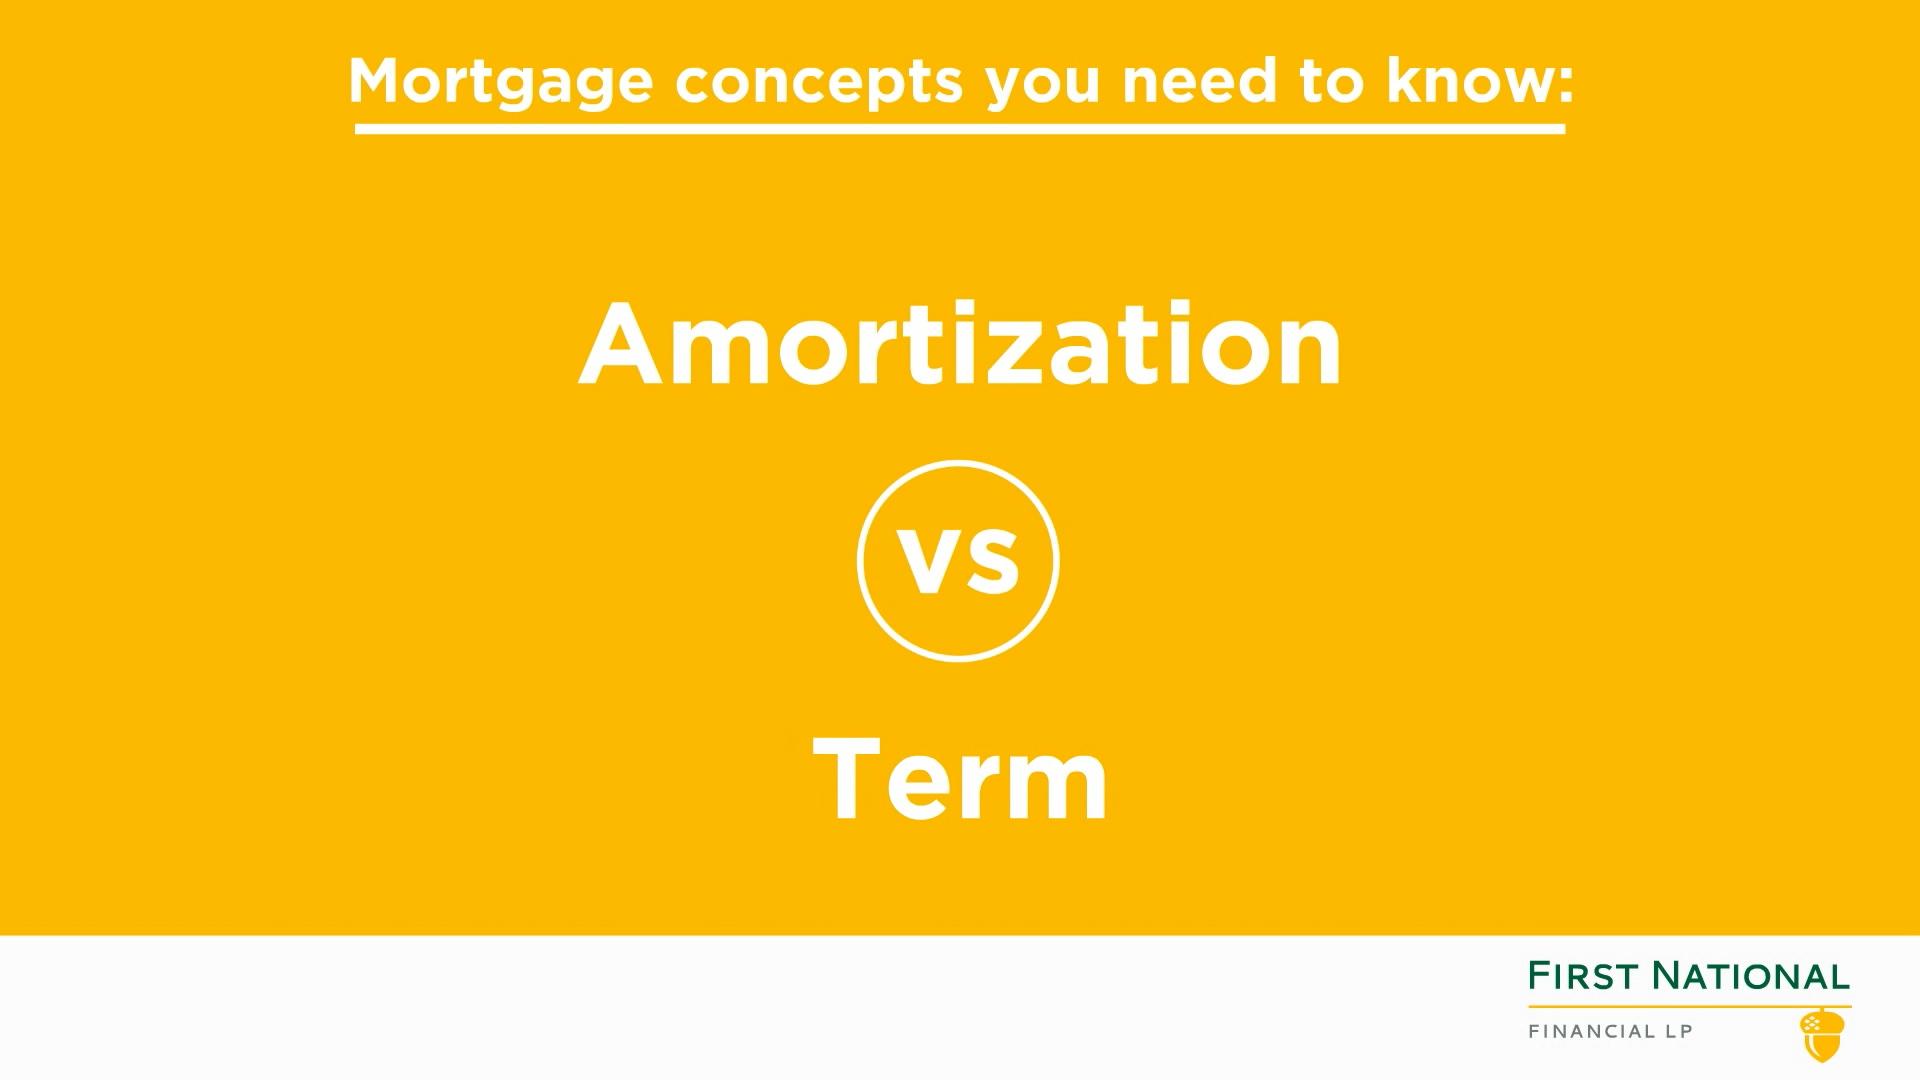 Amortization vs Term